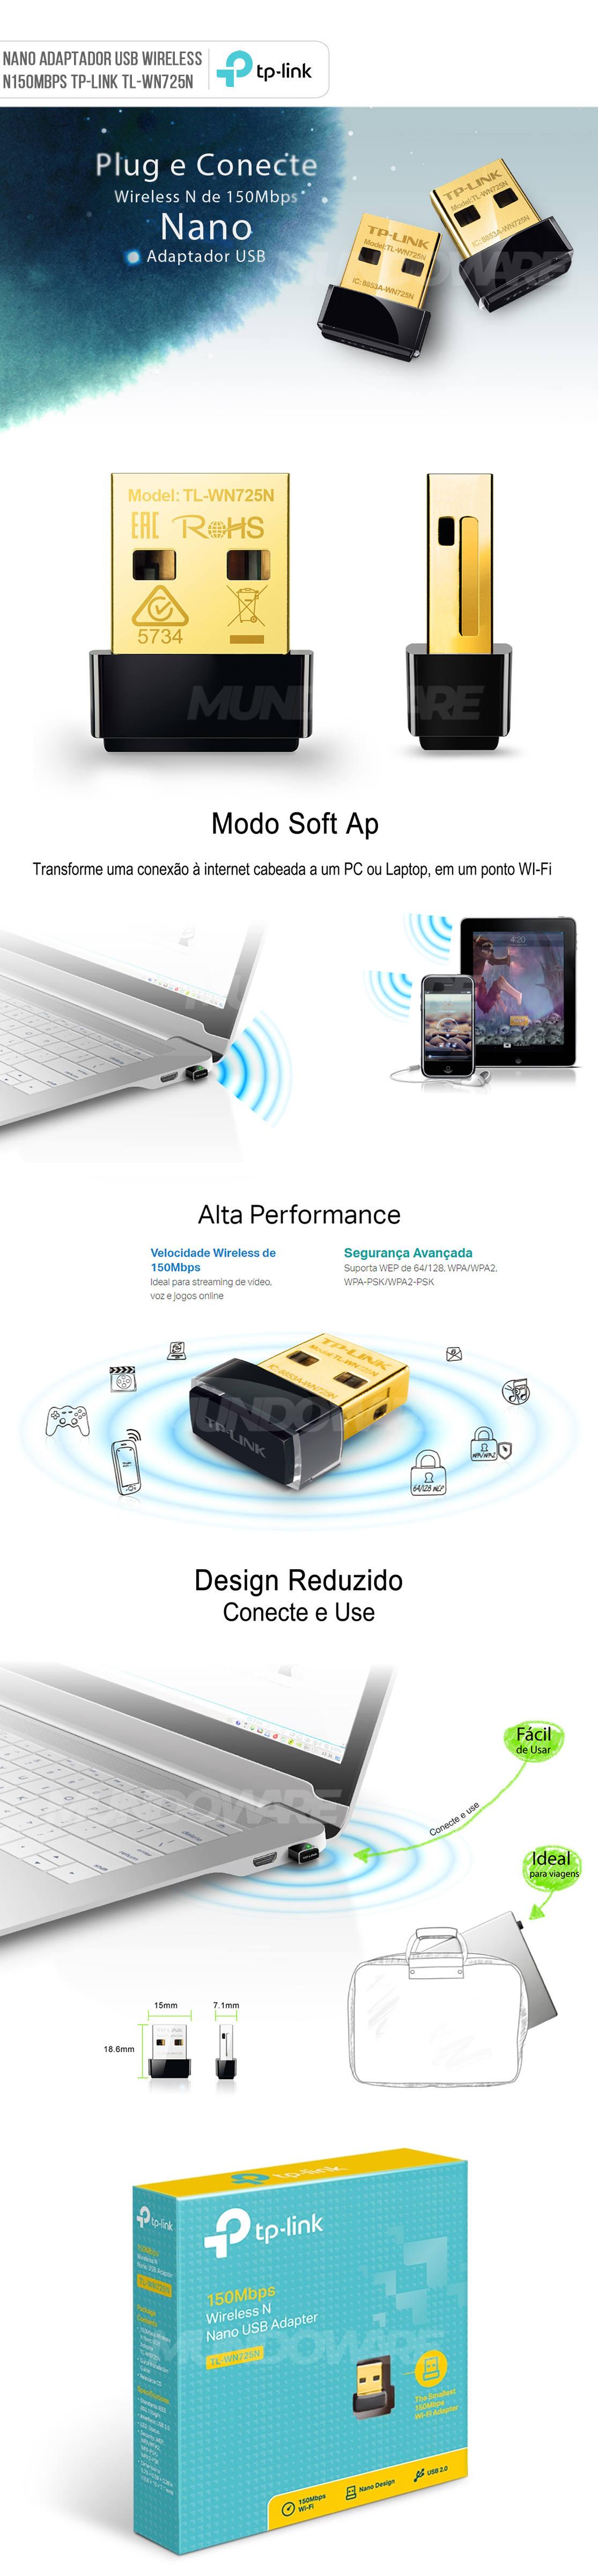 Nano Adaptador USB Wireless N150Mbps TP-Link TL-WN725N